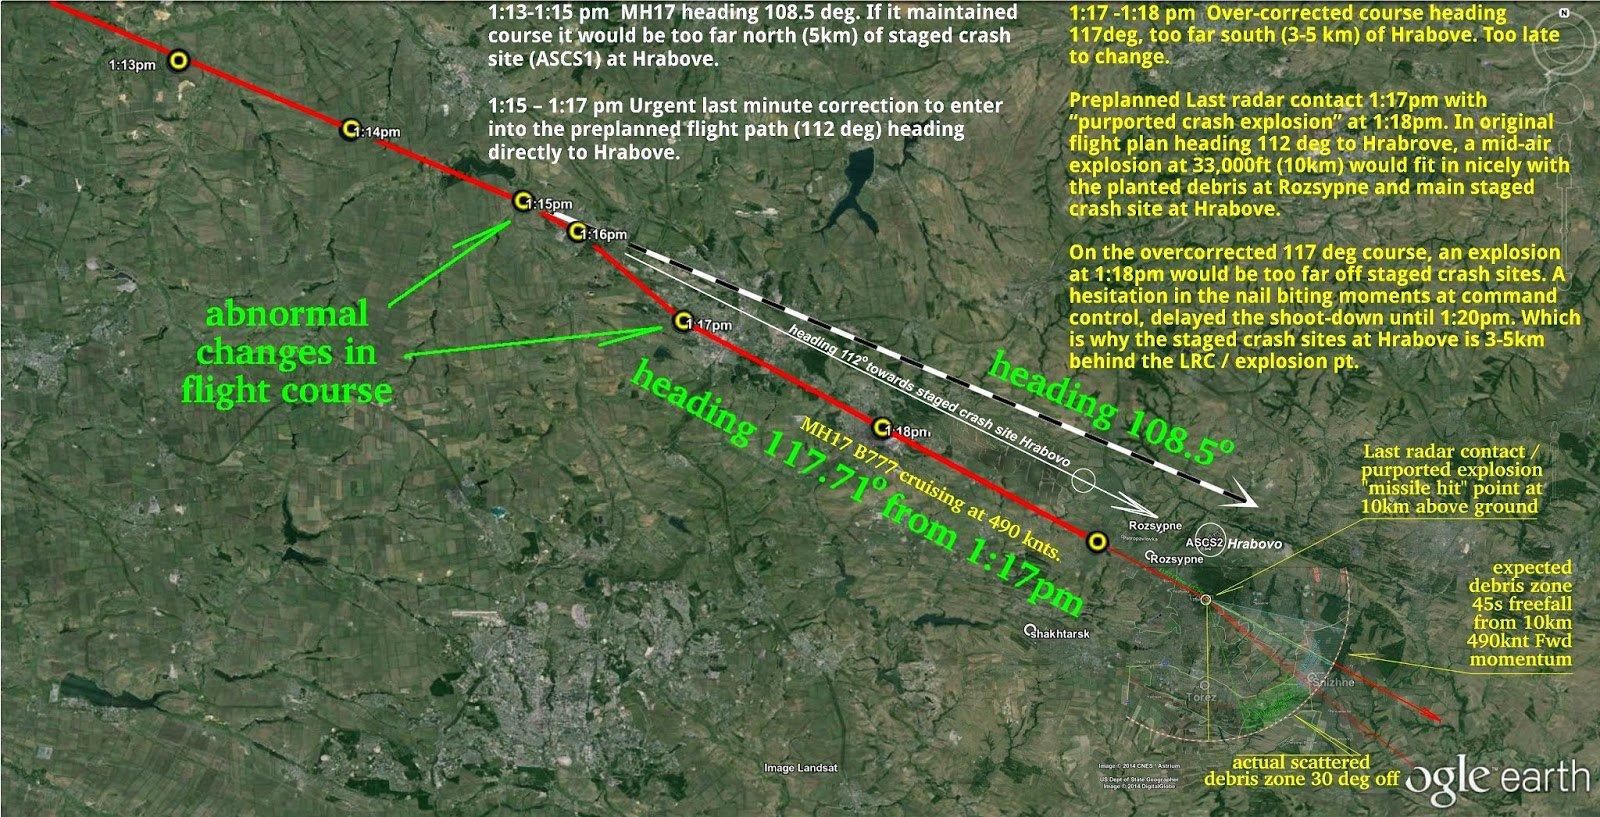 """human Resources Investigation Template"" Unique Lockerbie Plane Crash Debris Field Map Act Airline Crashes"